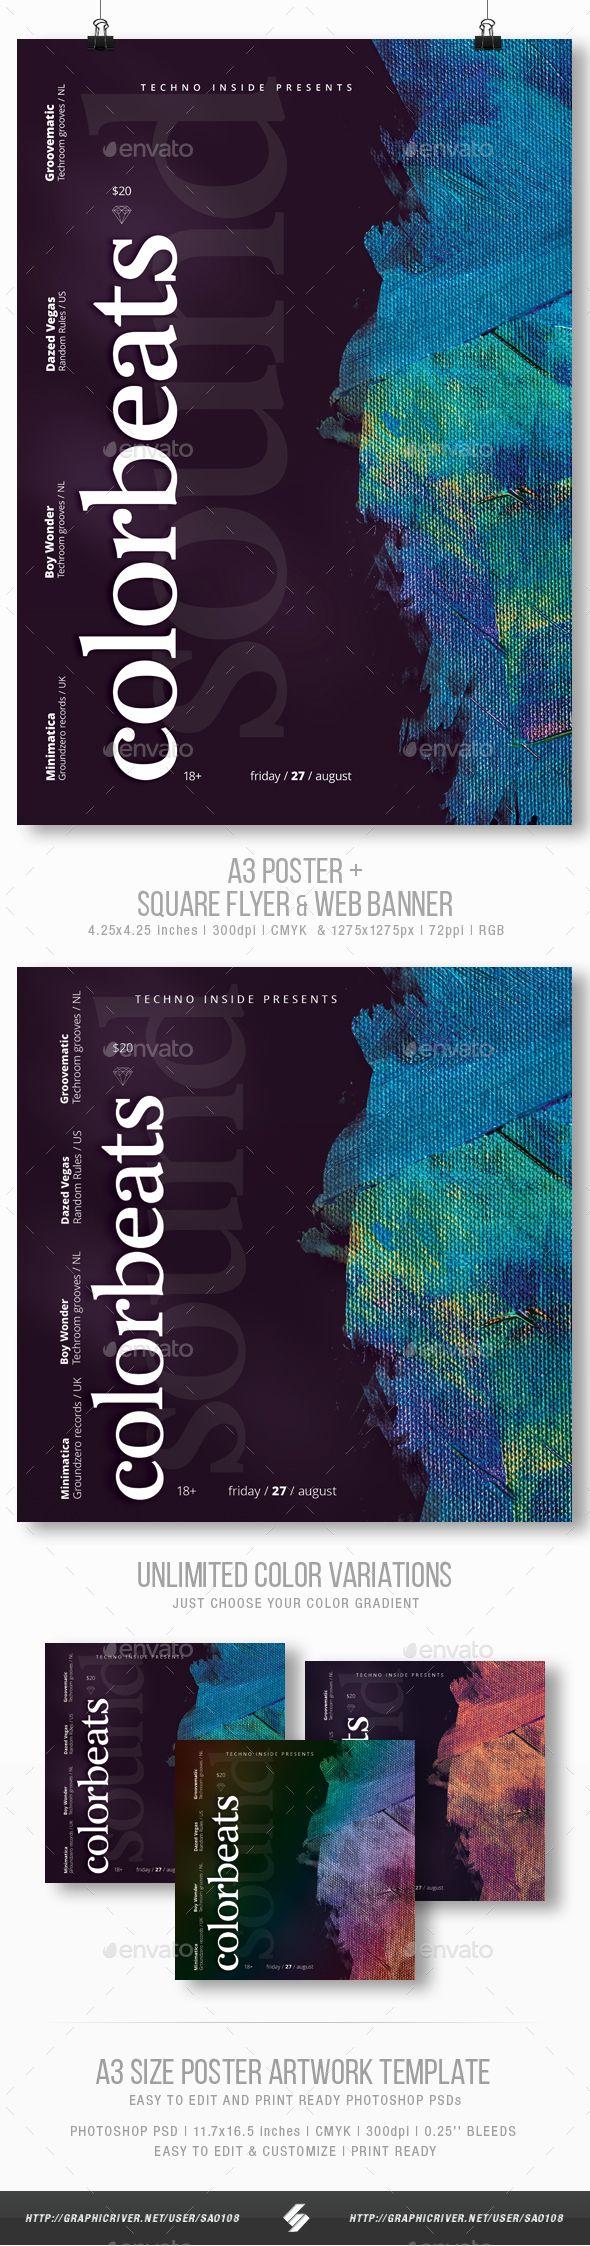 Colorbeats - Minimal Party Flyer / Poster Template A3. Professional club party flyer template. #flyer #design #printDesign #party #club #print #abstract #alternative #artwork #breakbeat #creative #deephouse #dj #dnb #DrumAndBass #dubstep #electro #event #HouseMusic #instagram #liquidfunk #minimal #nudisco #photoshop #poster #progressive #session #techhouse #techno #trap #typography #WebBanner